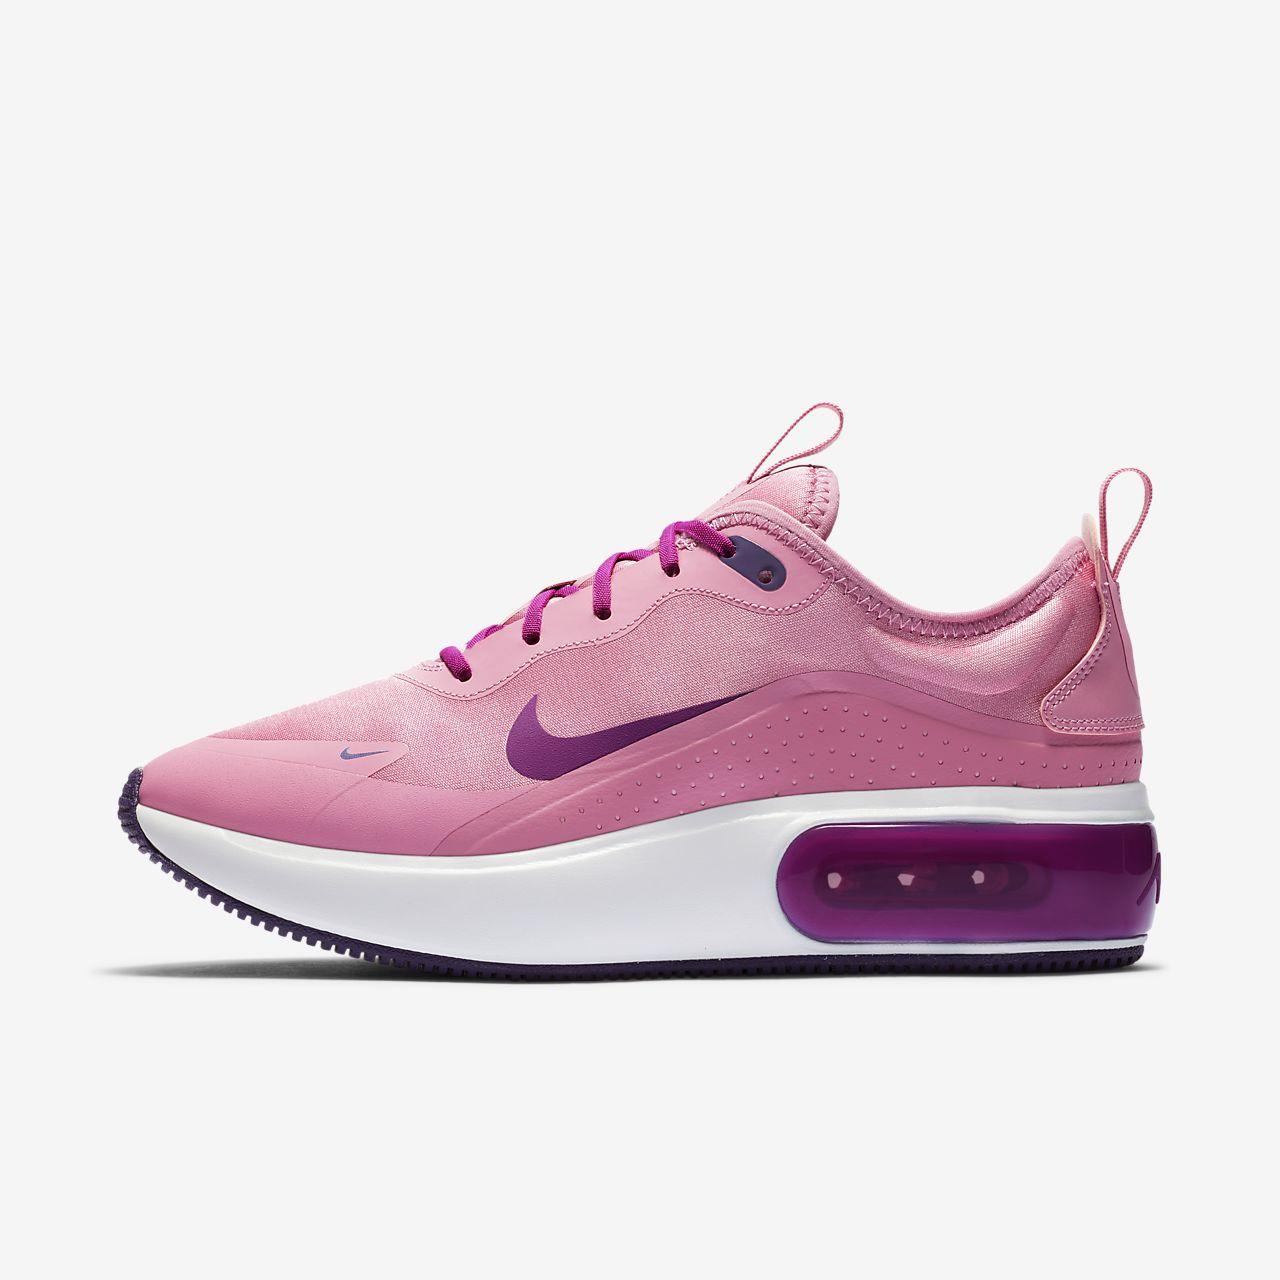 Nike Air Max 90 Lx női utcai cipő rózsaszín 39